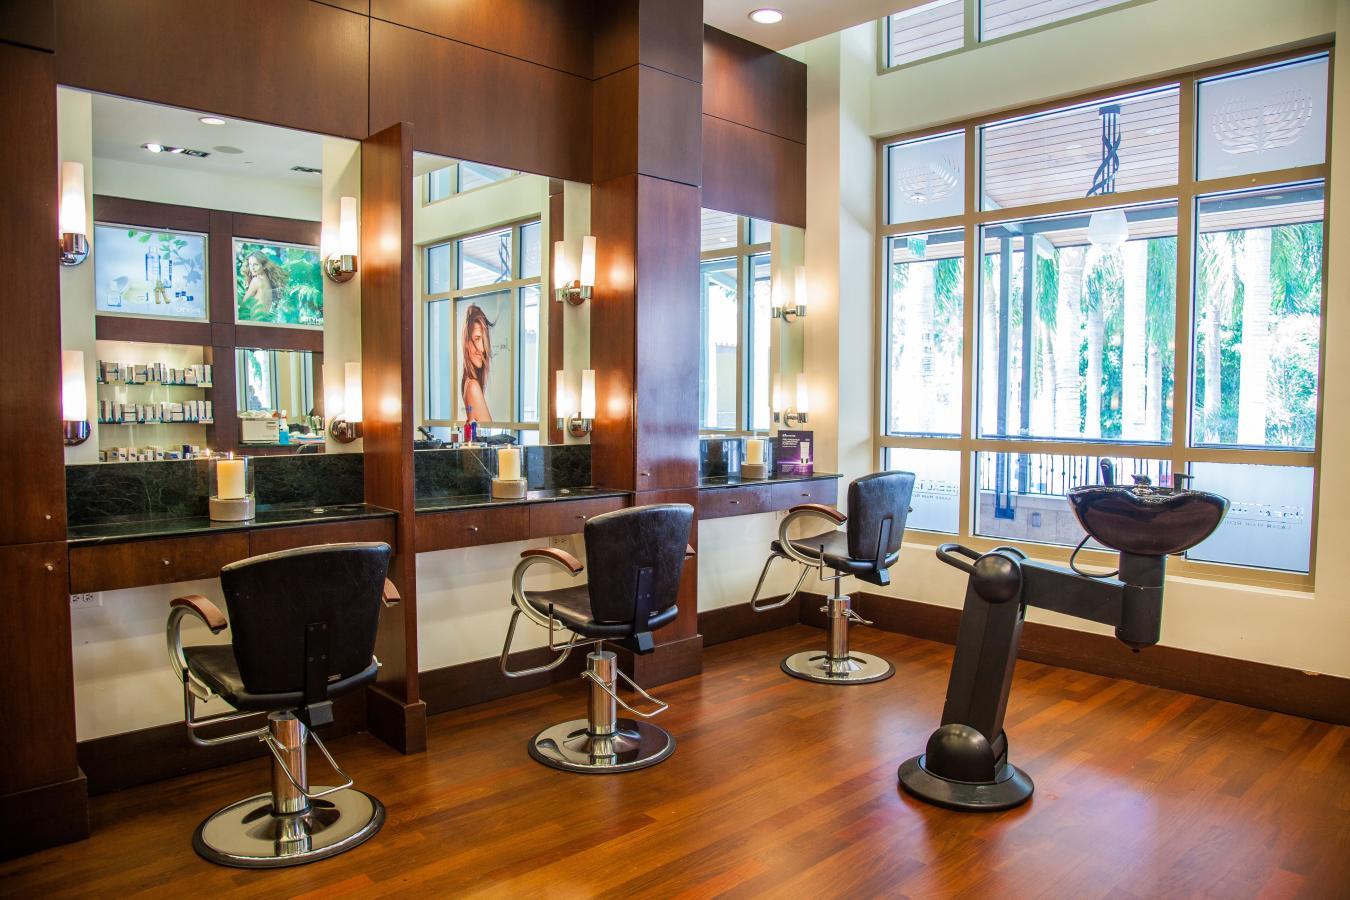 Salon at Elemis Day Spa, Merrick Park.